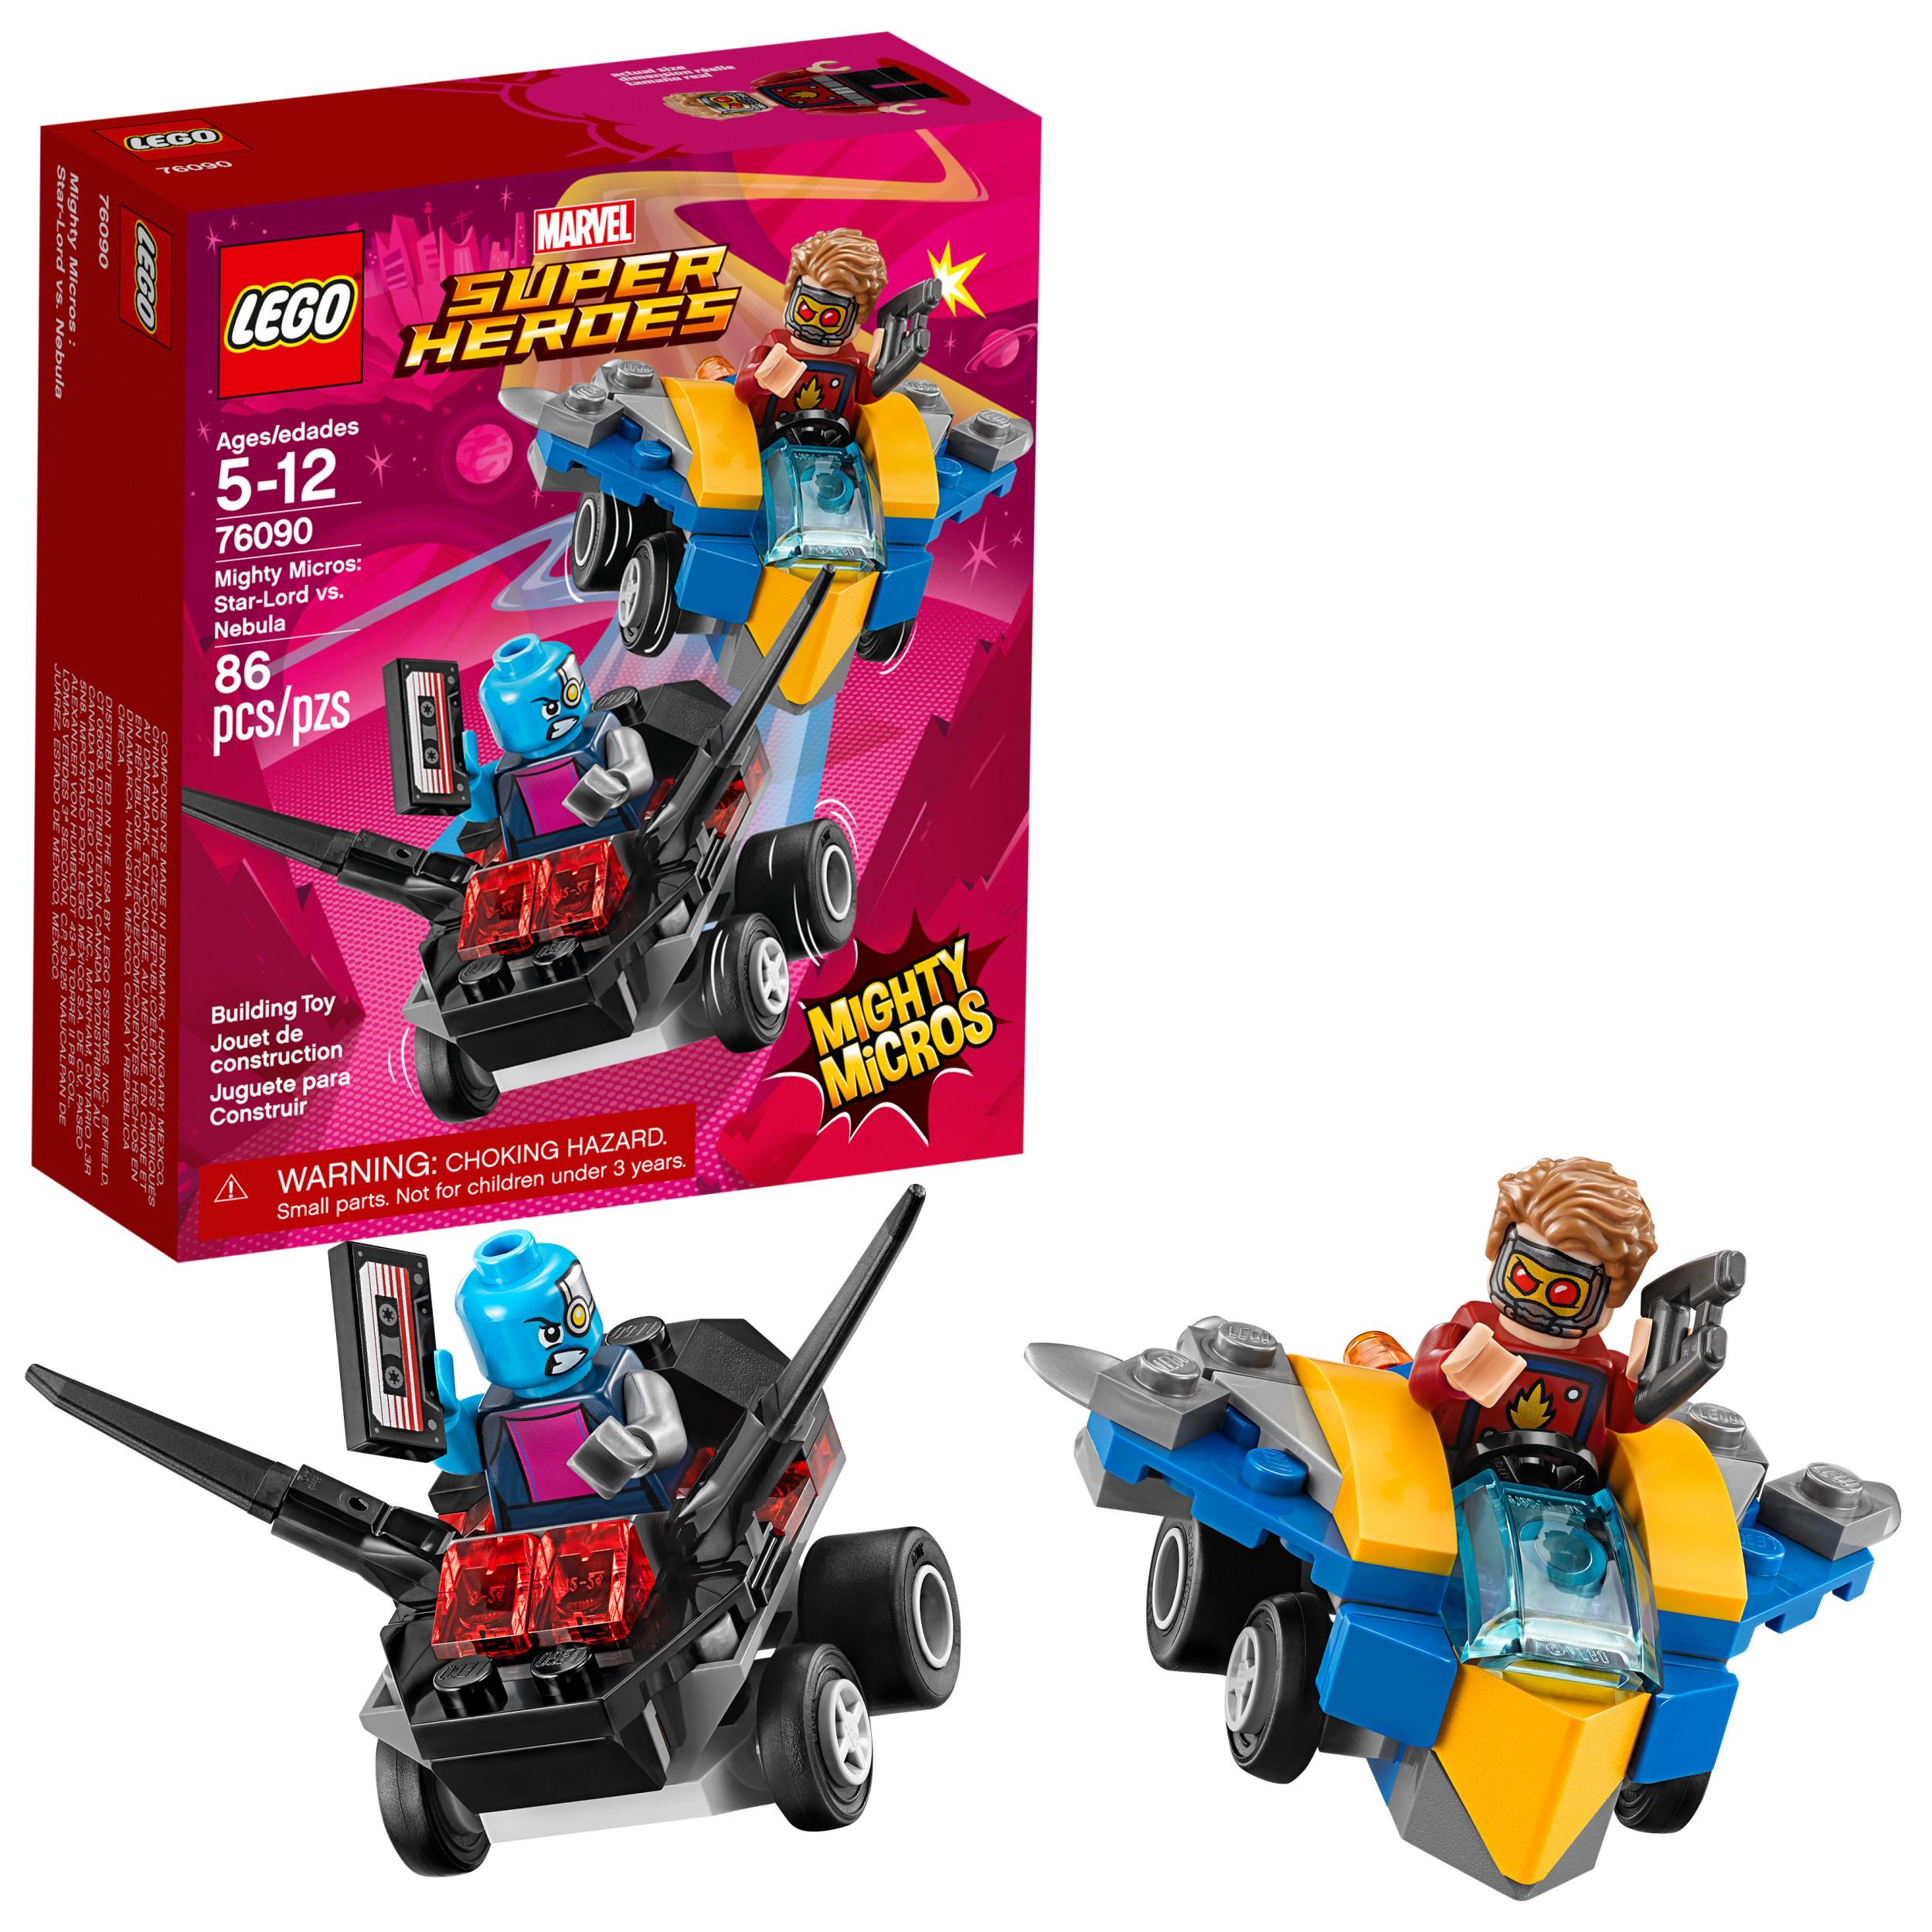 LEGO Super Heroes Mighty Micros: Star-Lord vs. Nebula 76090